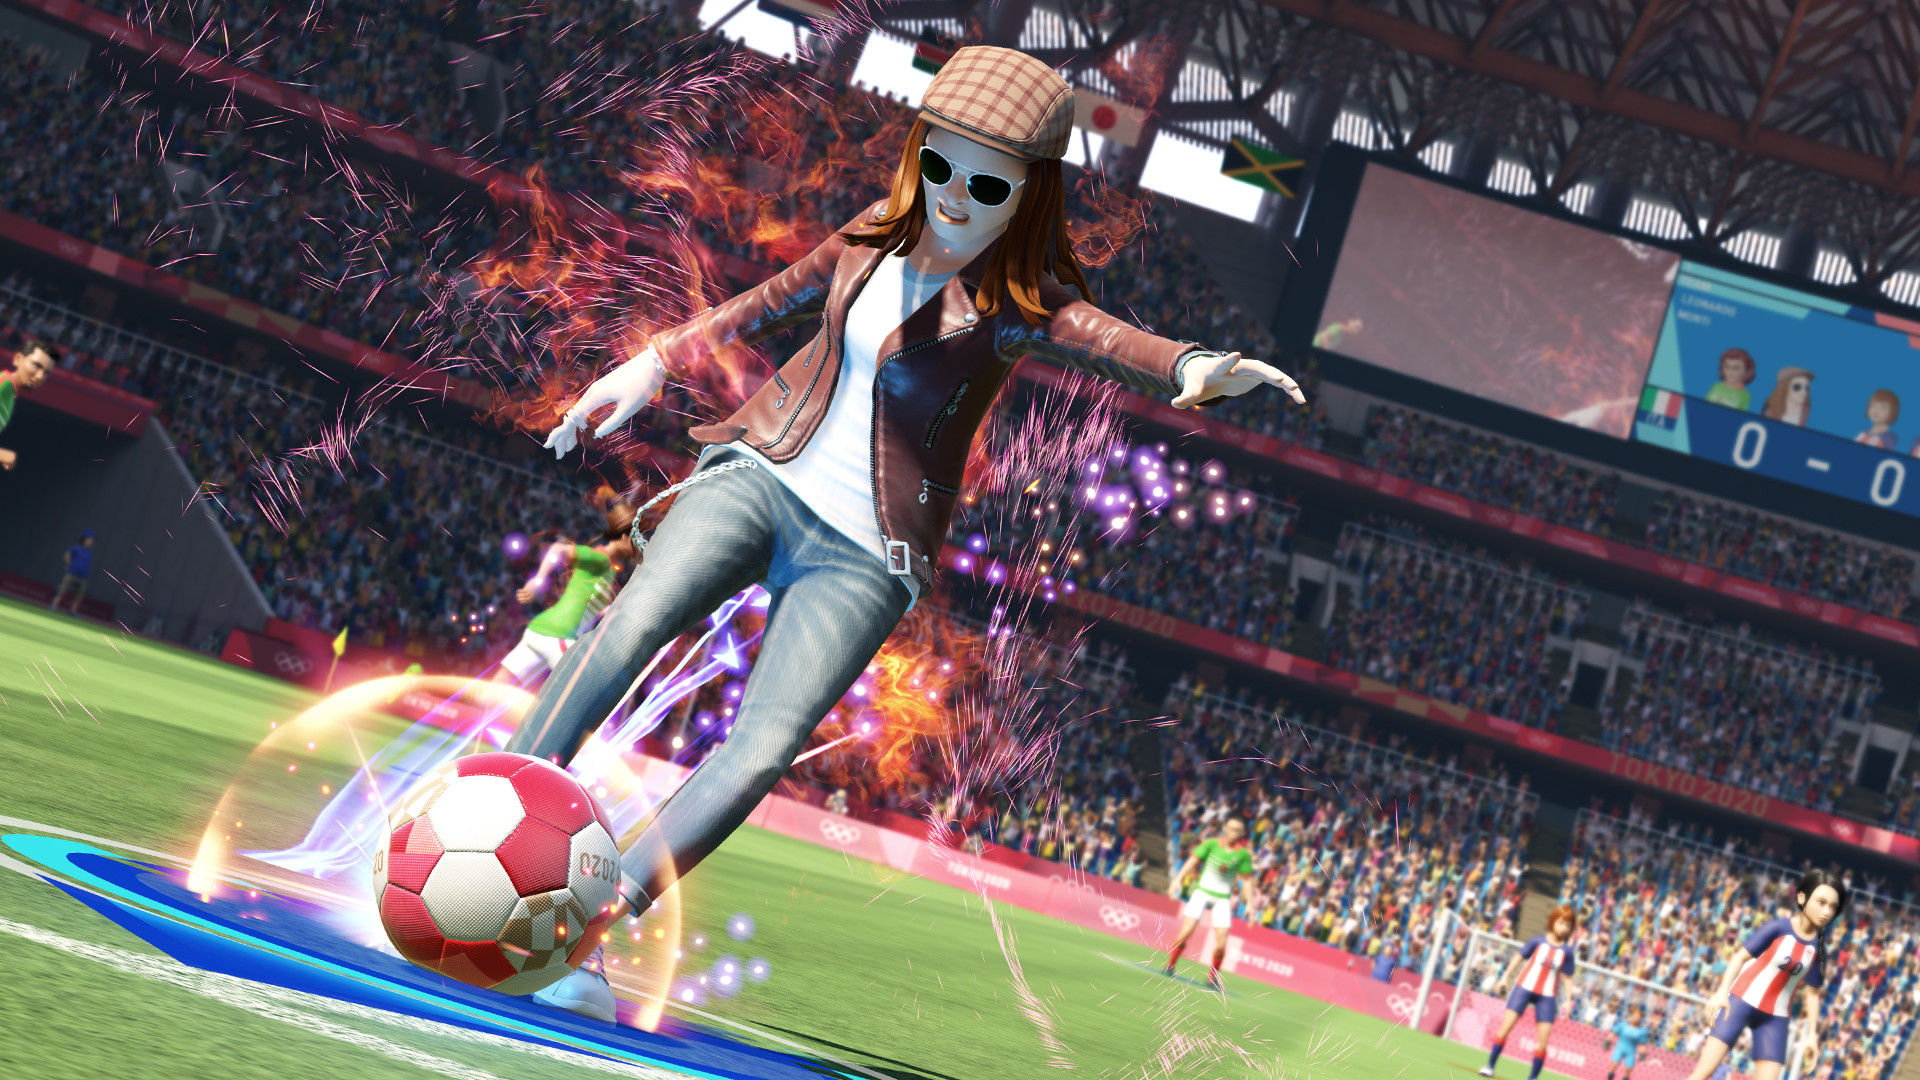 olympic-games-tokyo-2020-pc-screenshot-2